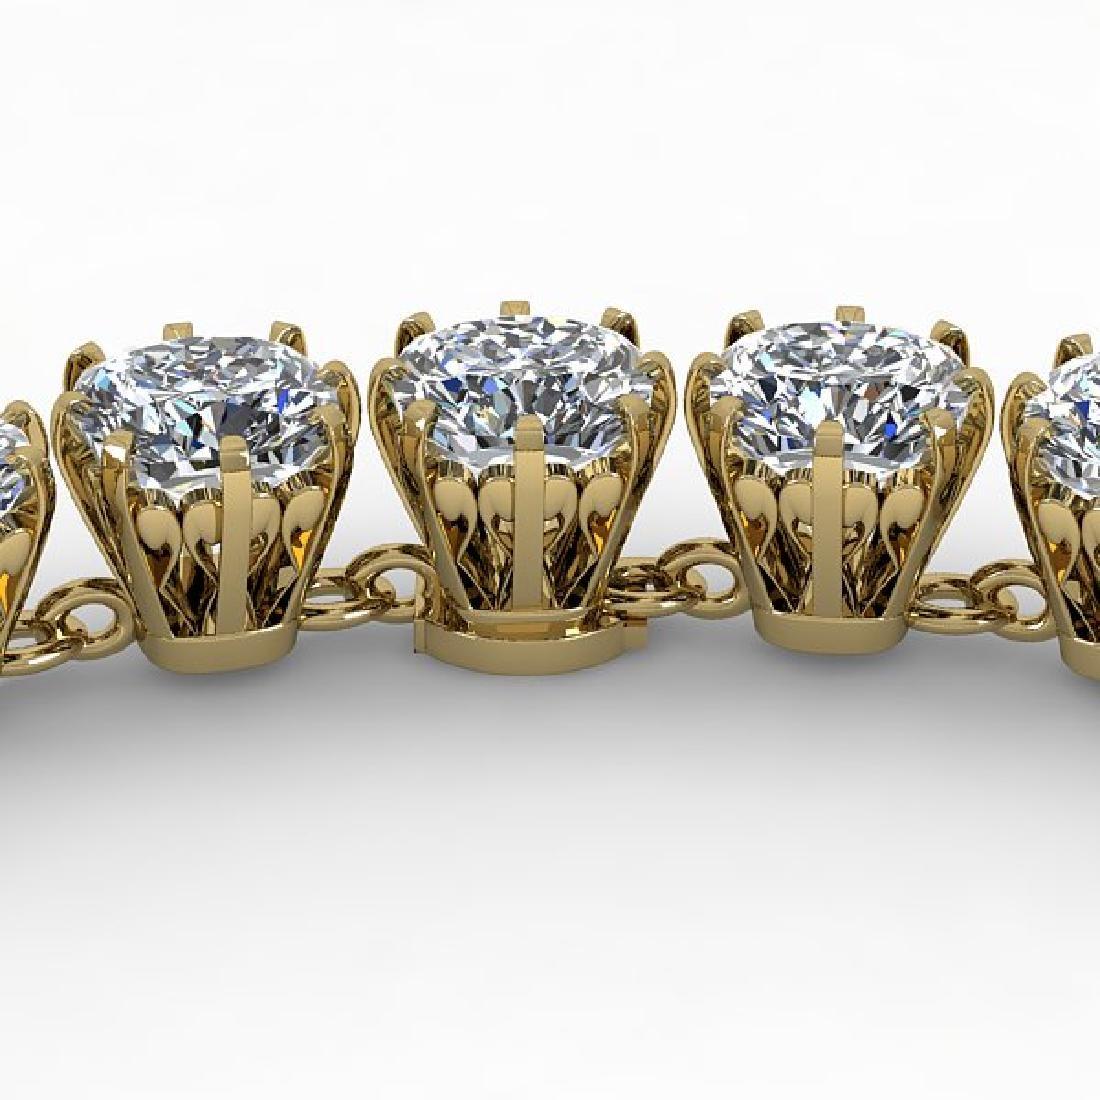 28 CTW Oval Cut SI Certified Diamond Necklace 14K